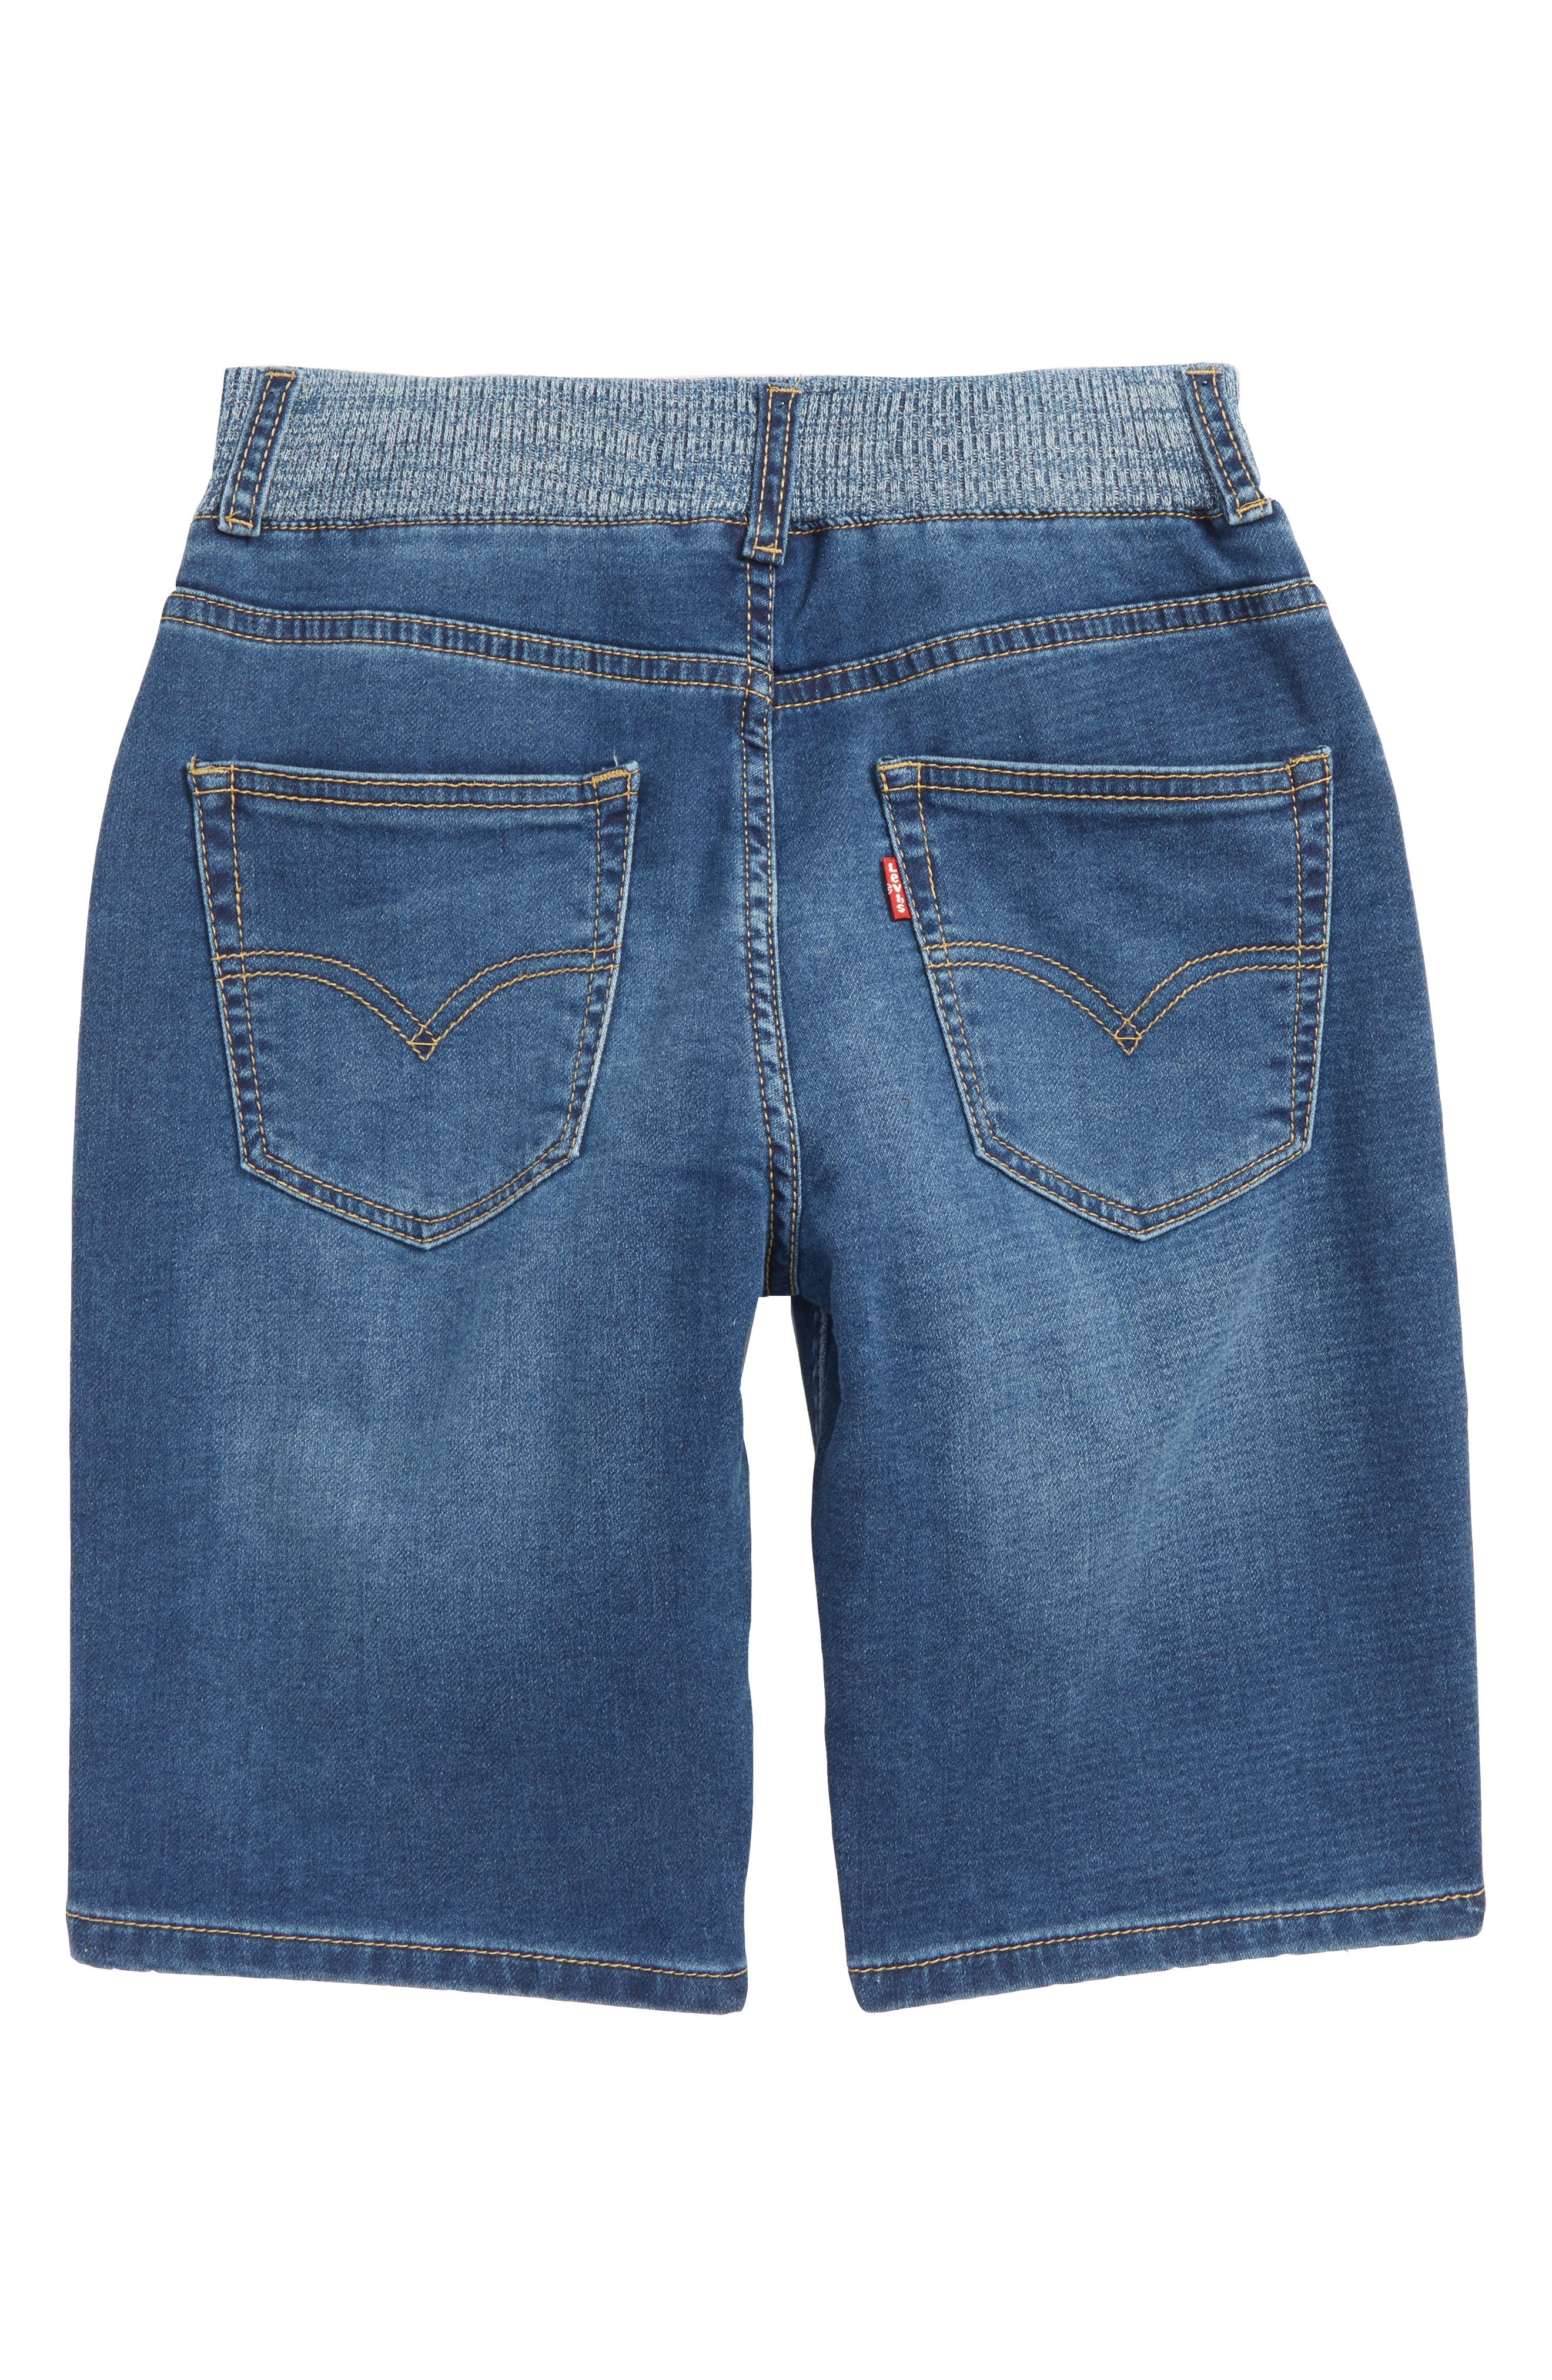 Levi's Super Chill Denim Shorts,                             Alternate thumbnail 2, color,                             421